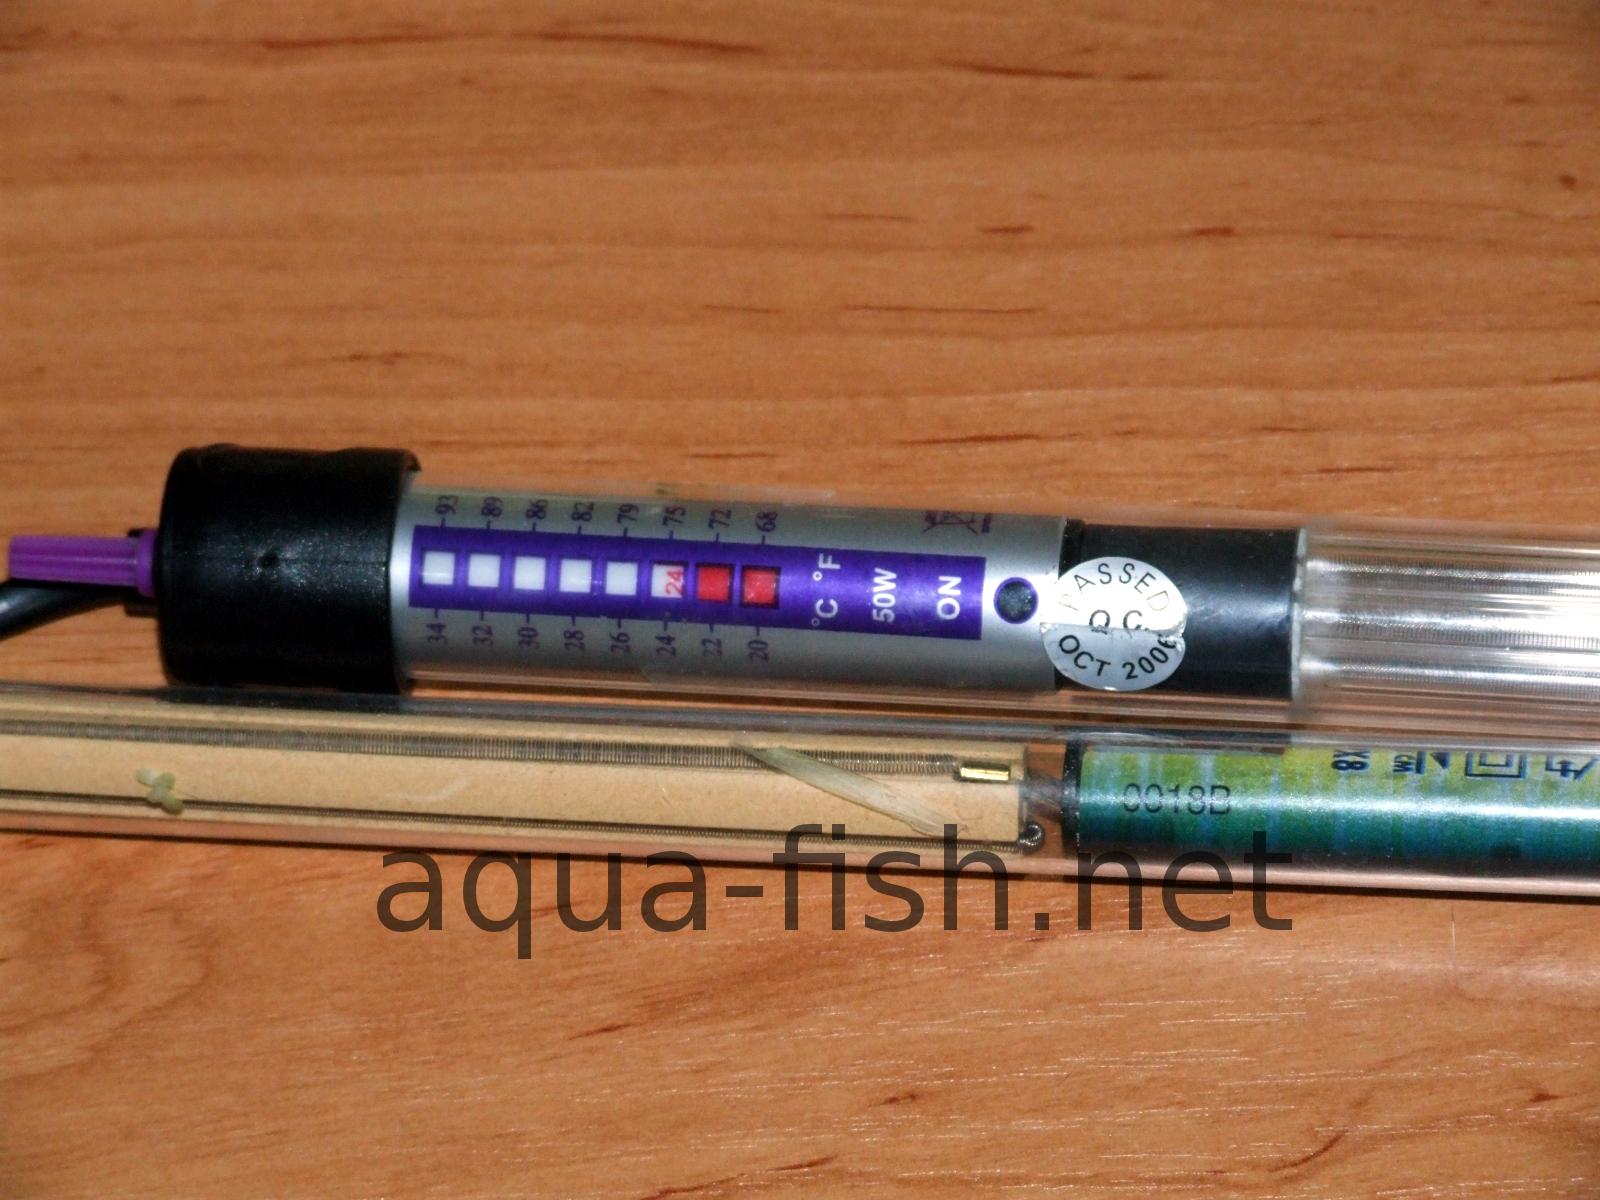 Aquarium fish tank instructions -  Submersible Aquarium Heaters Image 4 Resized